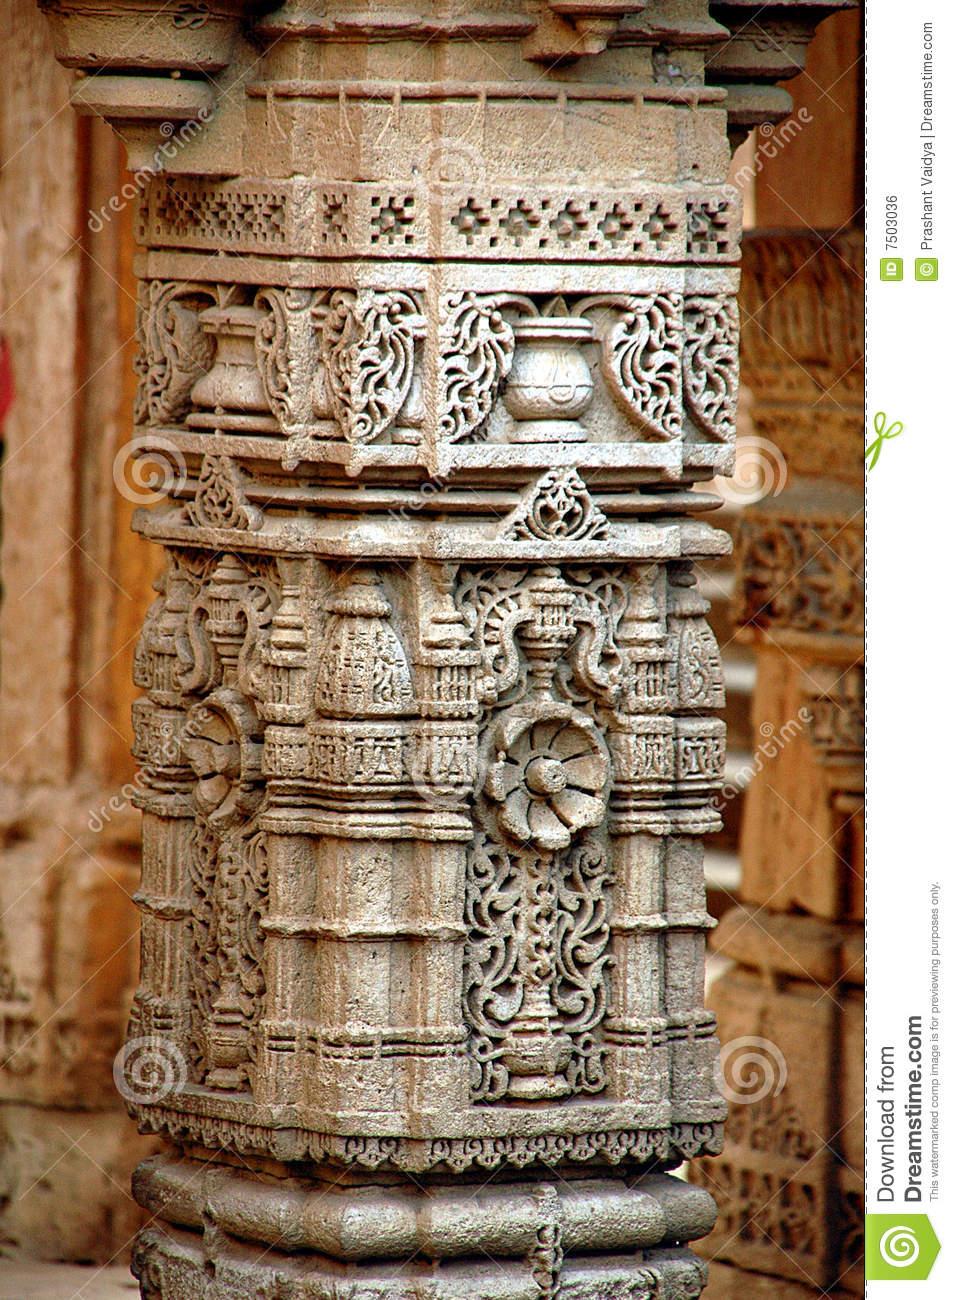 Stone Carving On Pillar Royalty Free Stock Image.